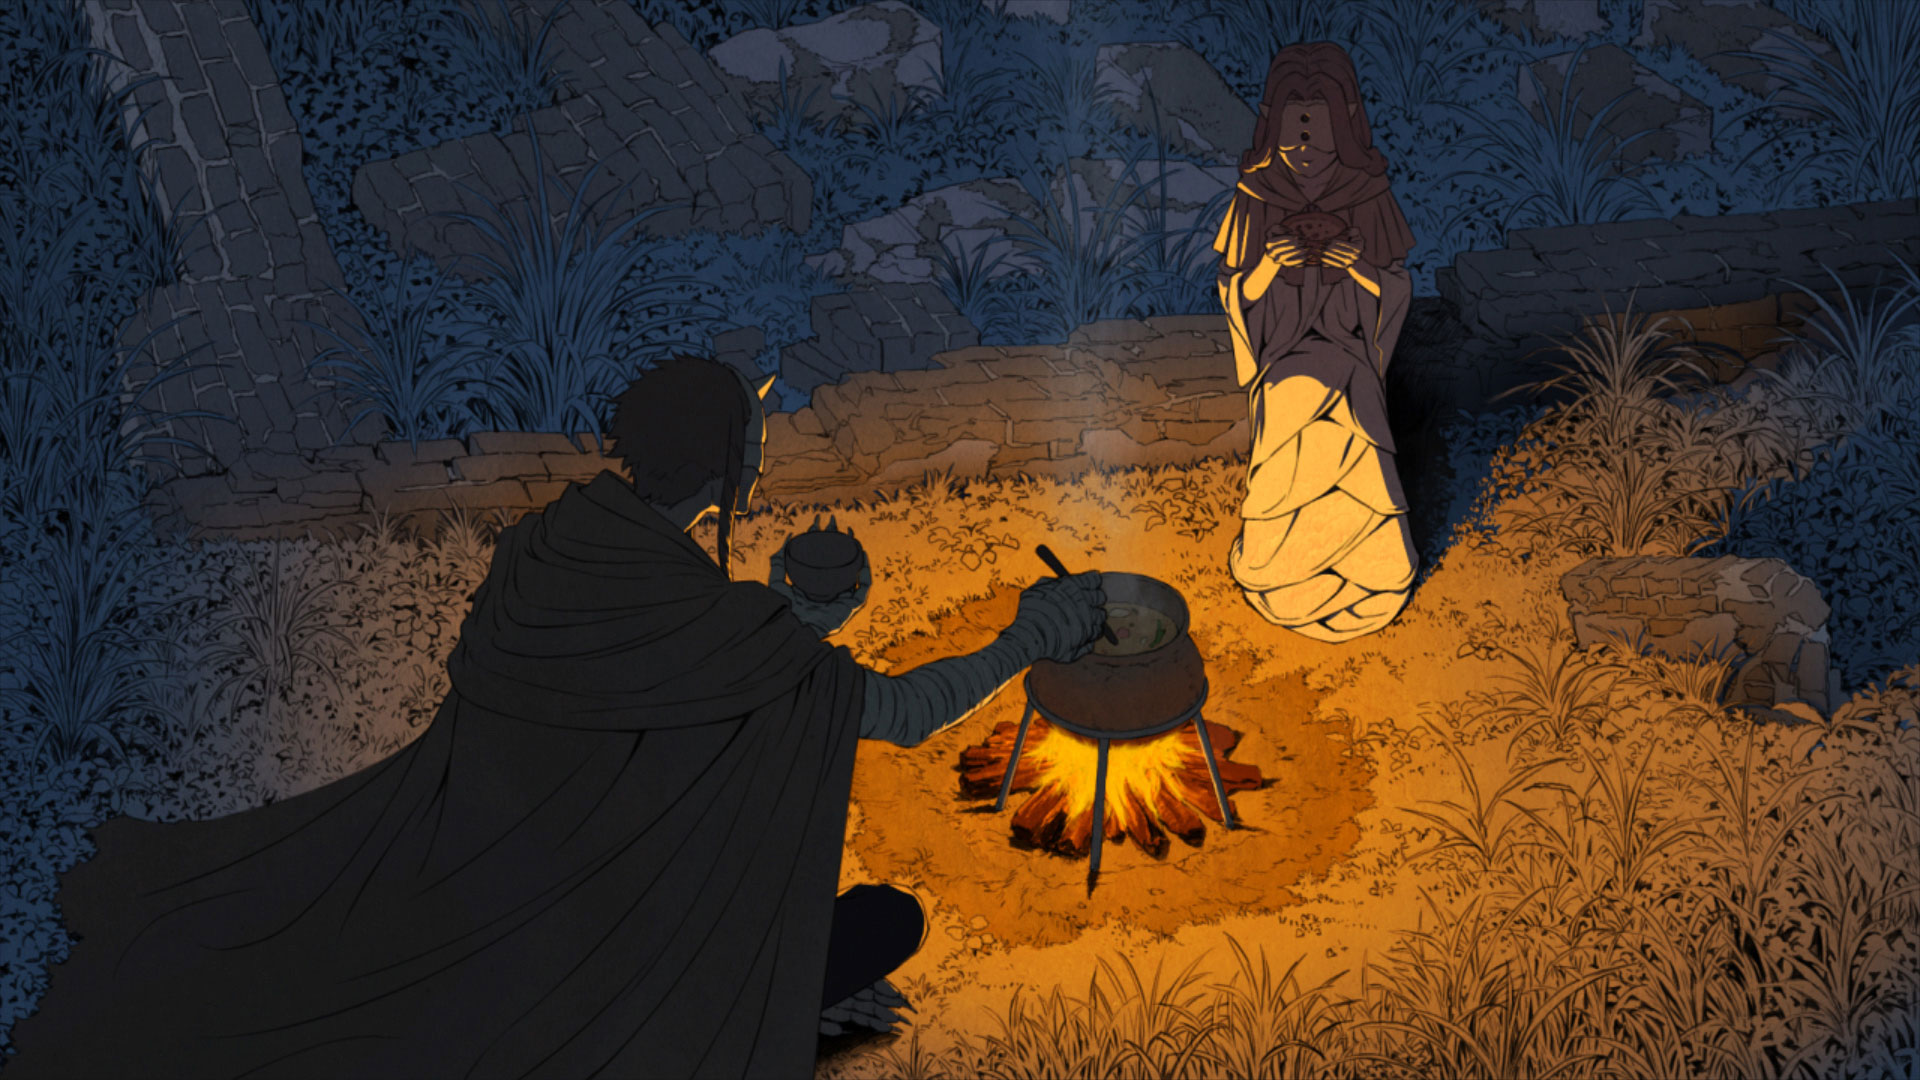 TVアニメ『約束のネバーランド Season 2』EDメイキング ~紺野大樹の世界②~